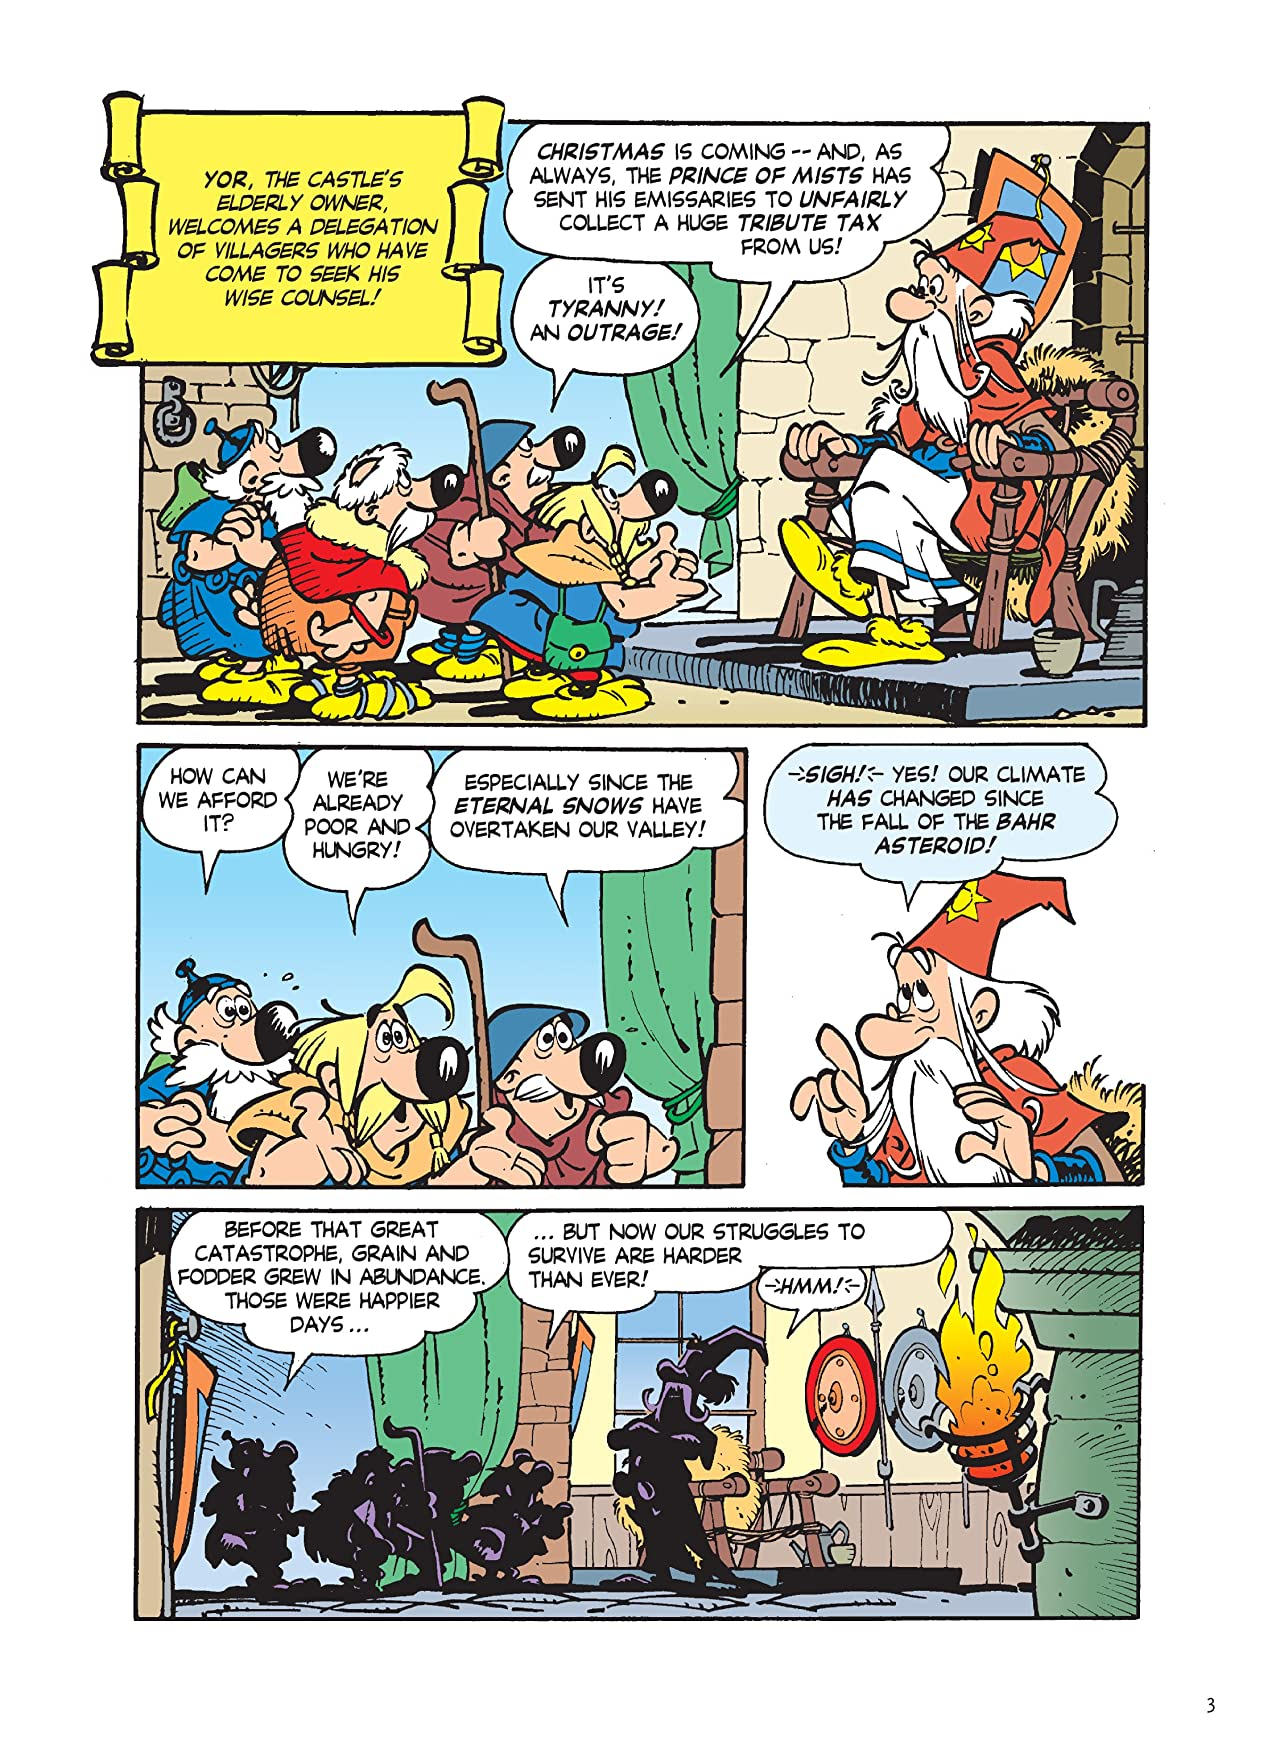 Disney Masters Vol. 9: Mickey Mouse: The Ice Sword Saga